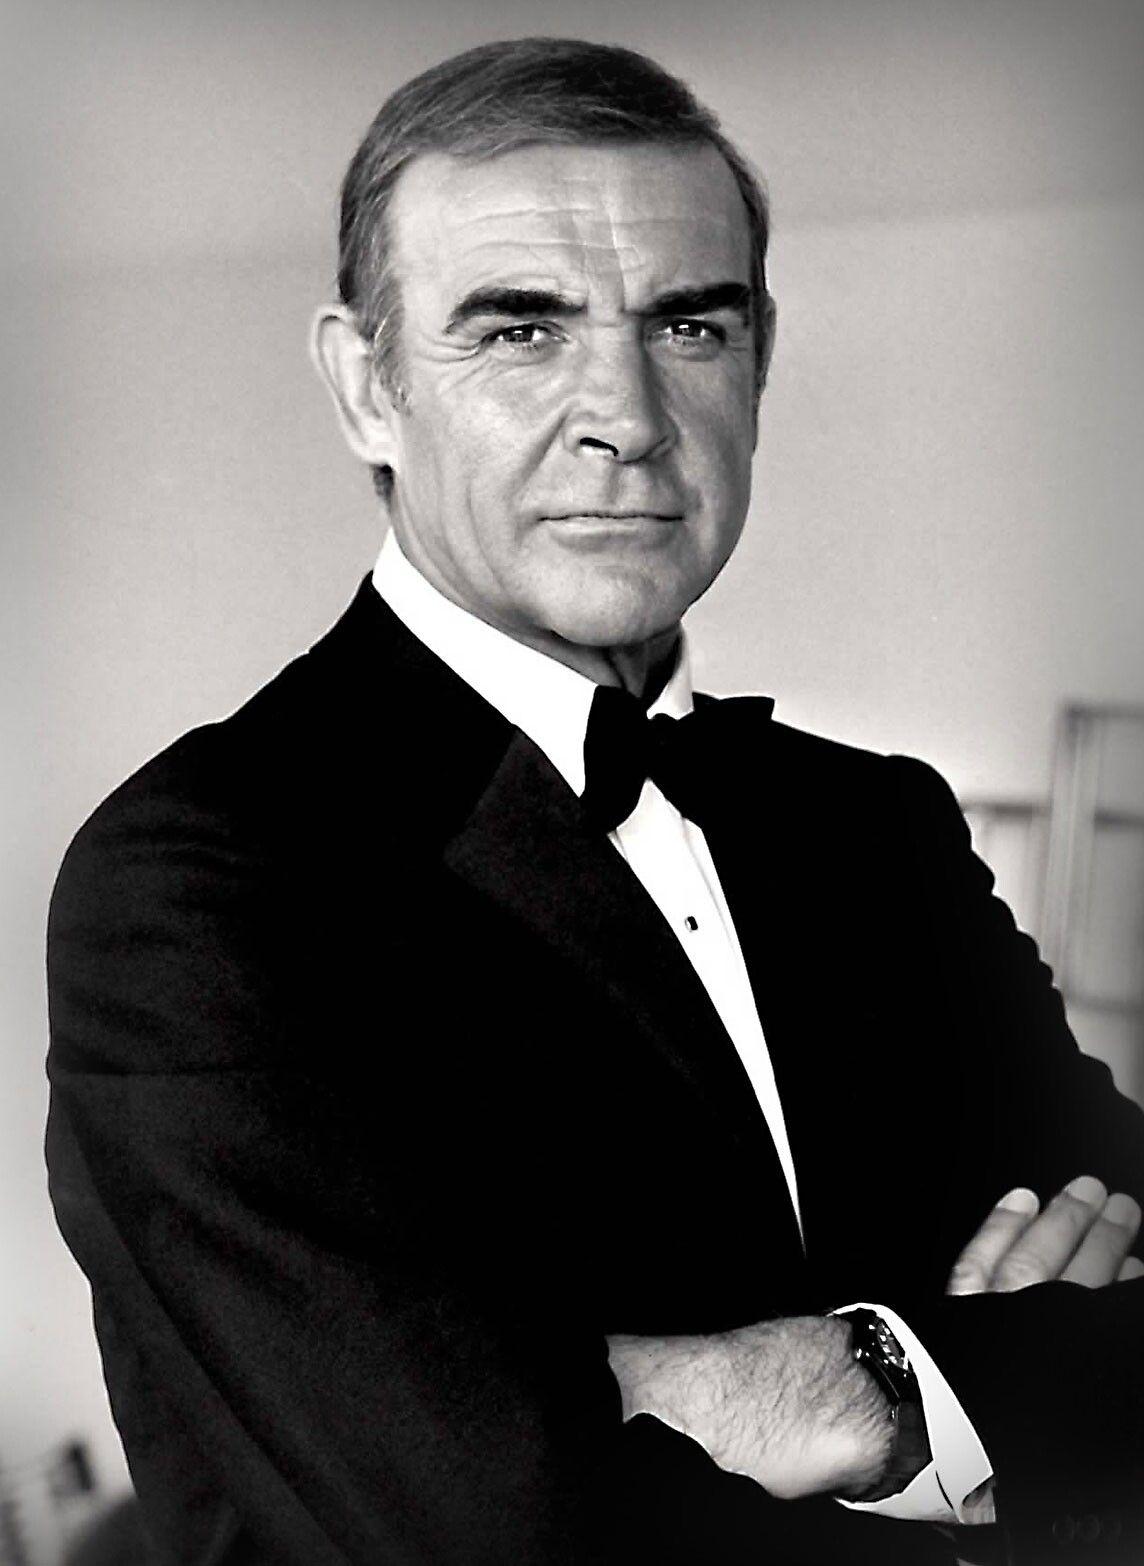 Sean Connery (born 1930)